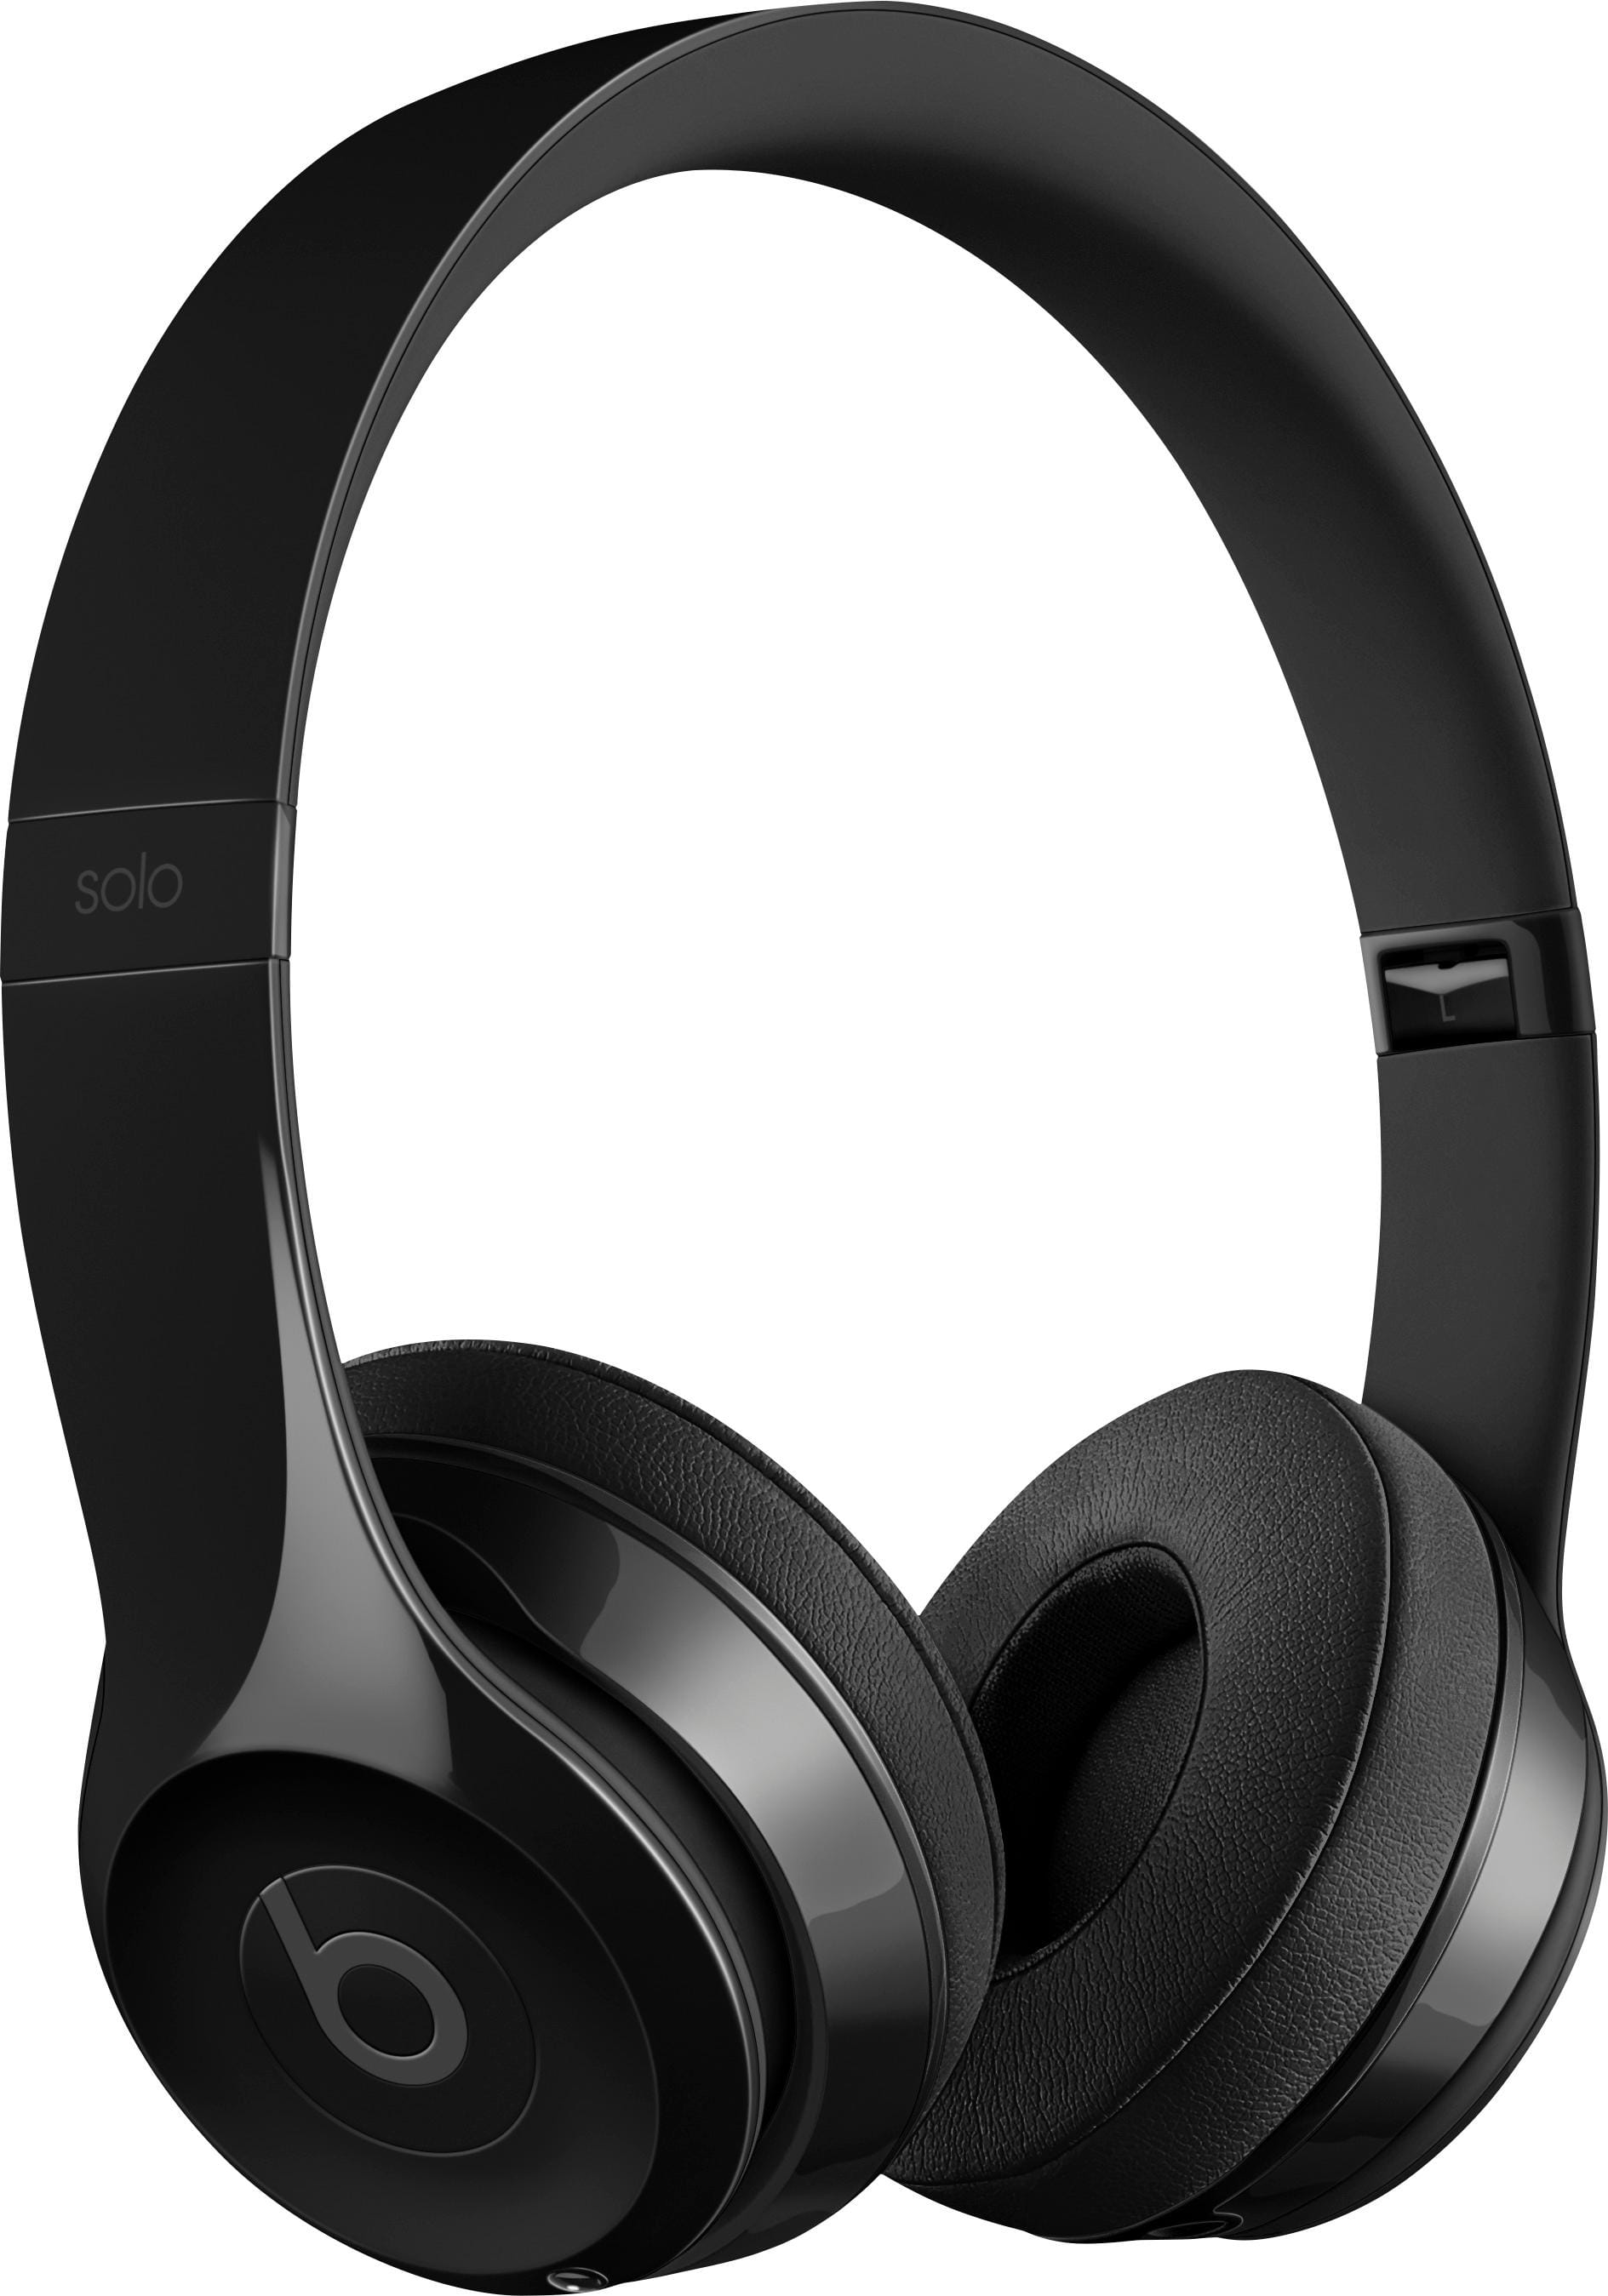 Beats by Dr. Dre Geek Squad Certified Refurbished Beats Solo3 Wireless Headphones Gloss Black GSRF-MNEN2LL/A-REFURBISHED - Best Buy $120